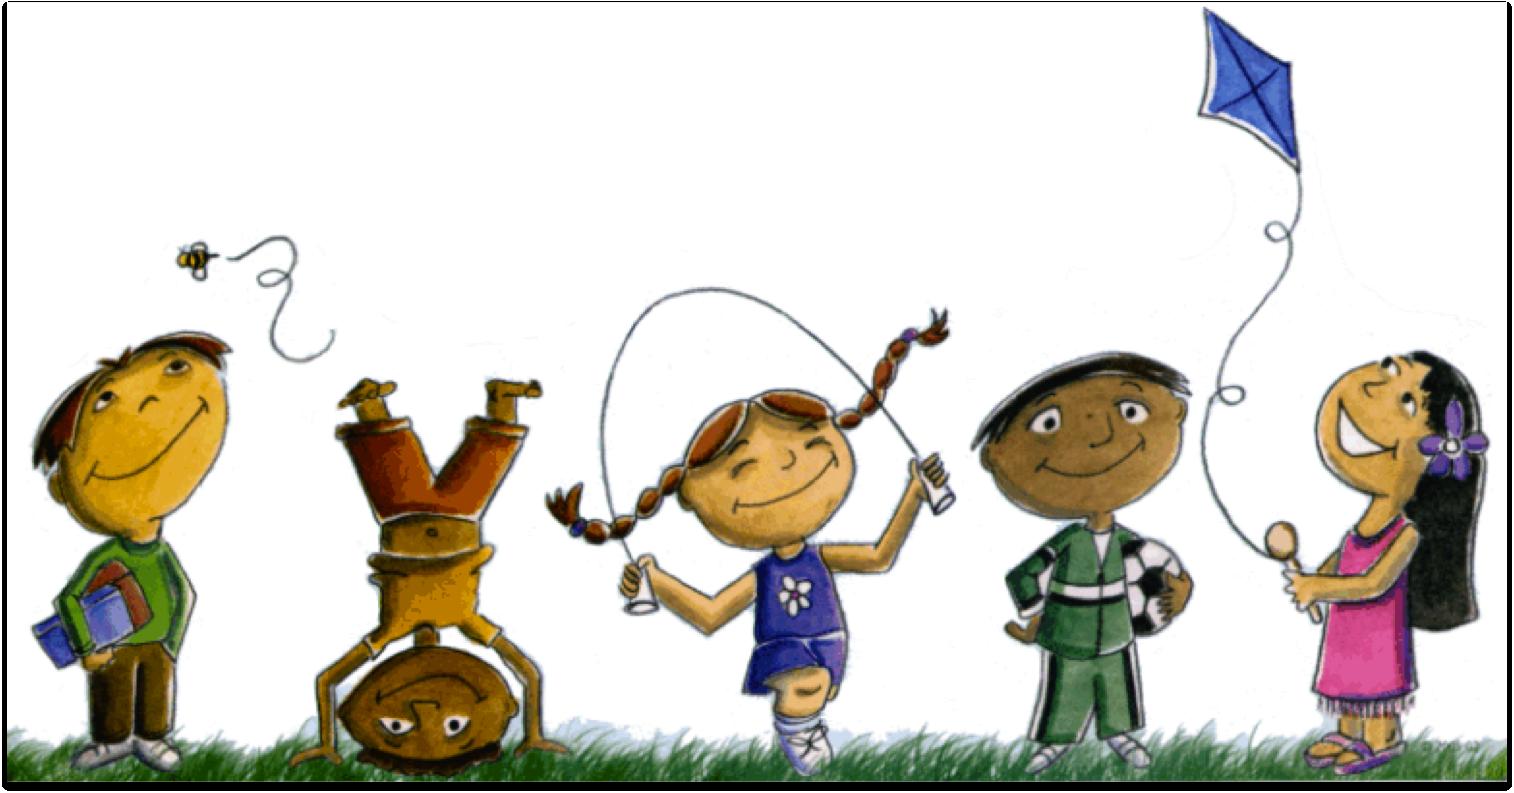 Image Children Playing Clip Art-Image children playing clip art-13